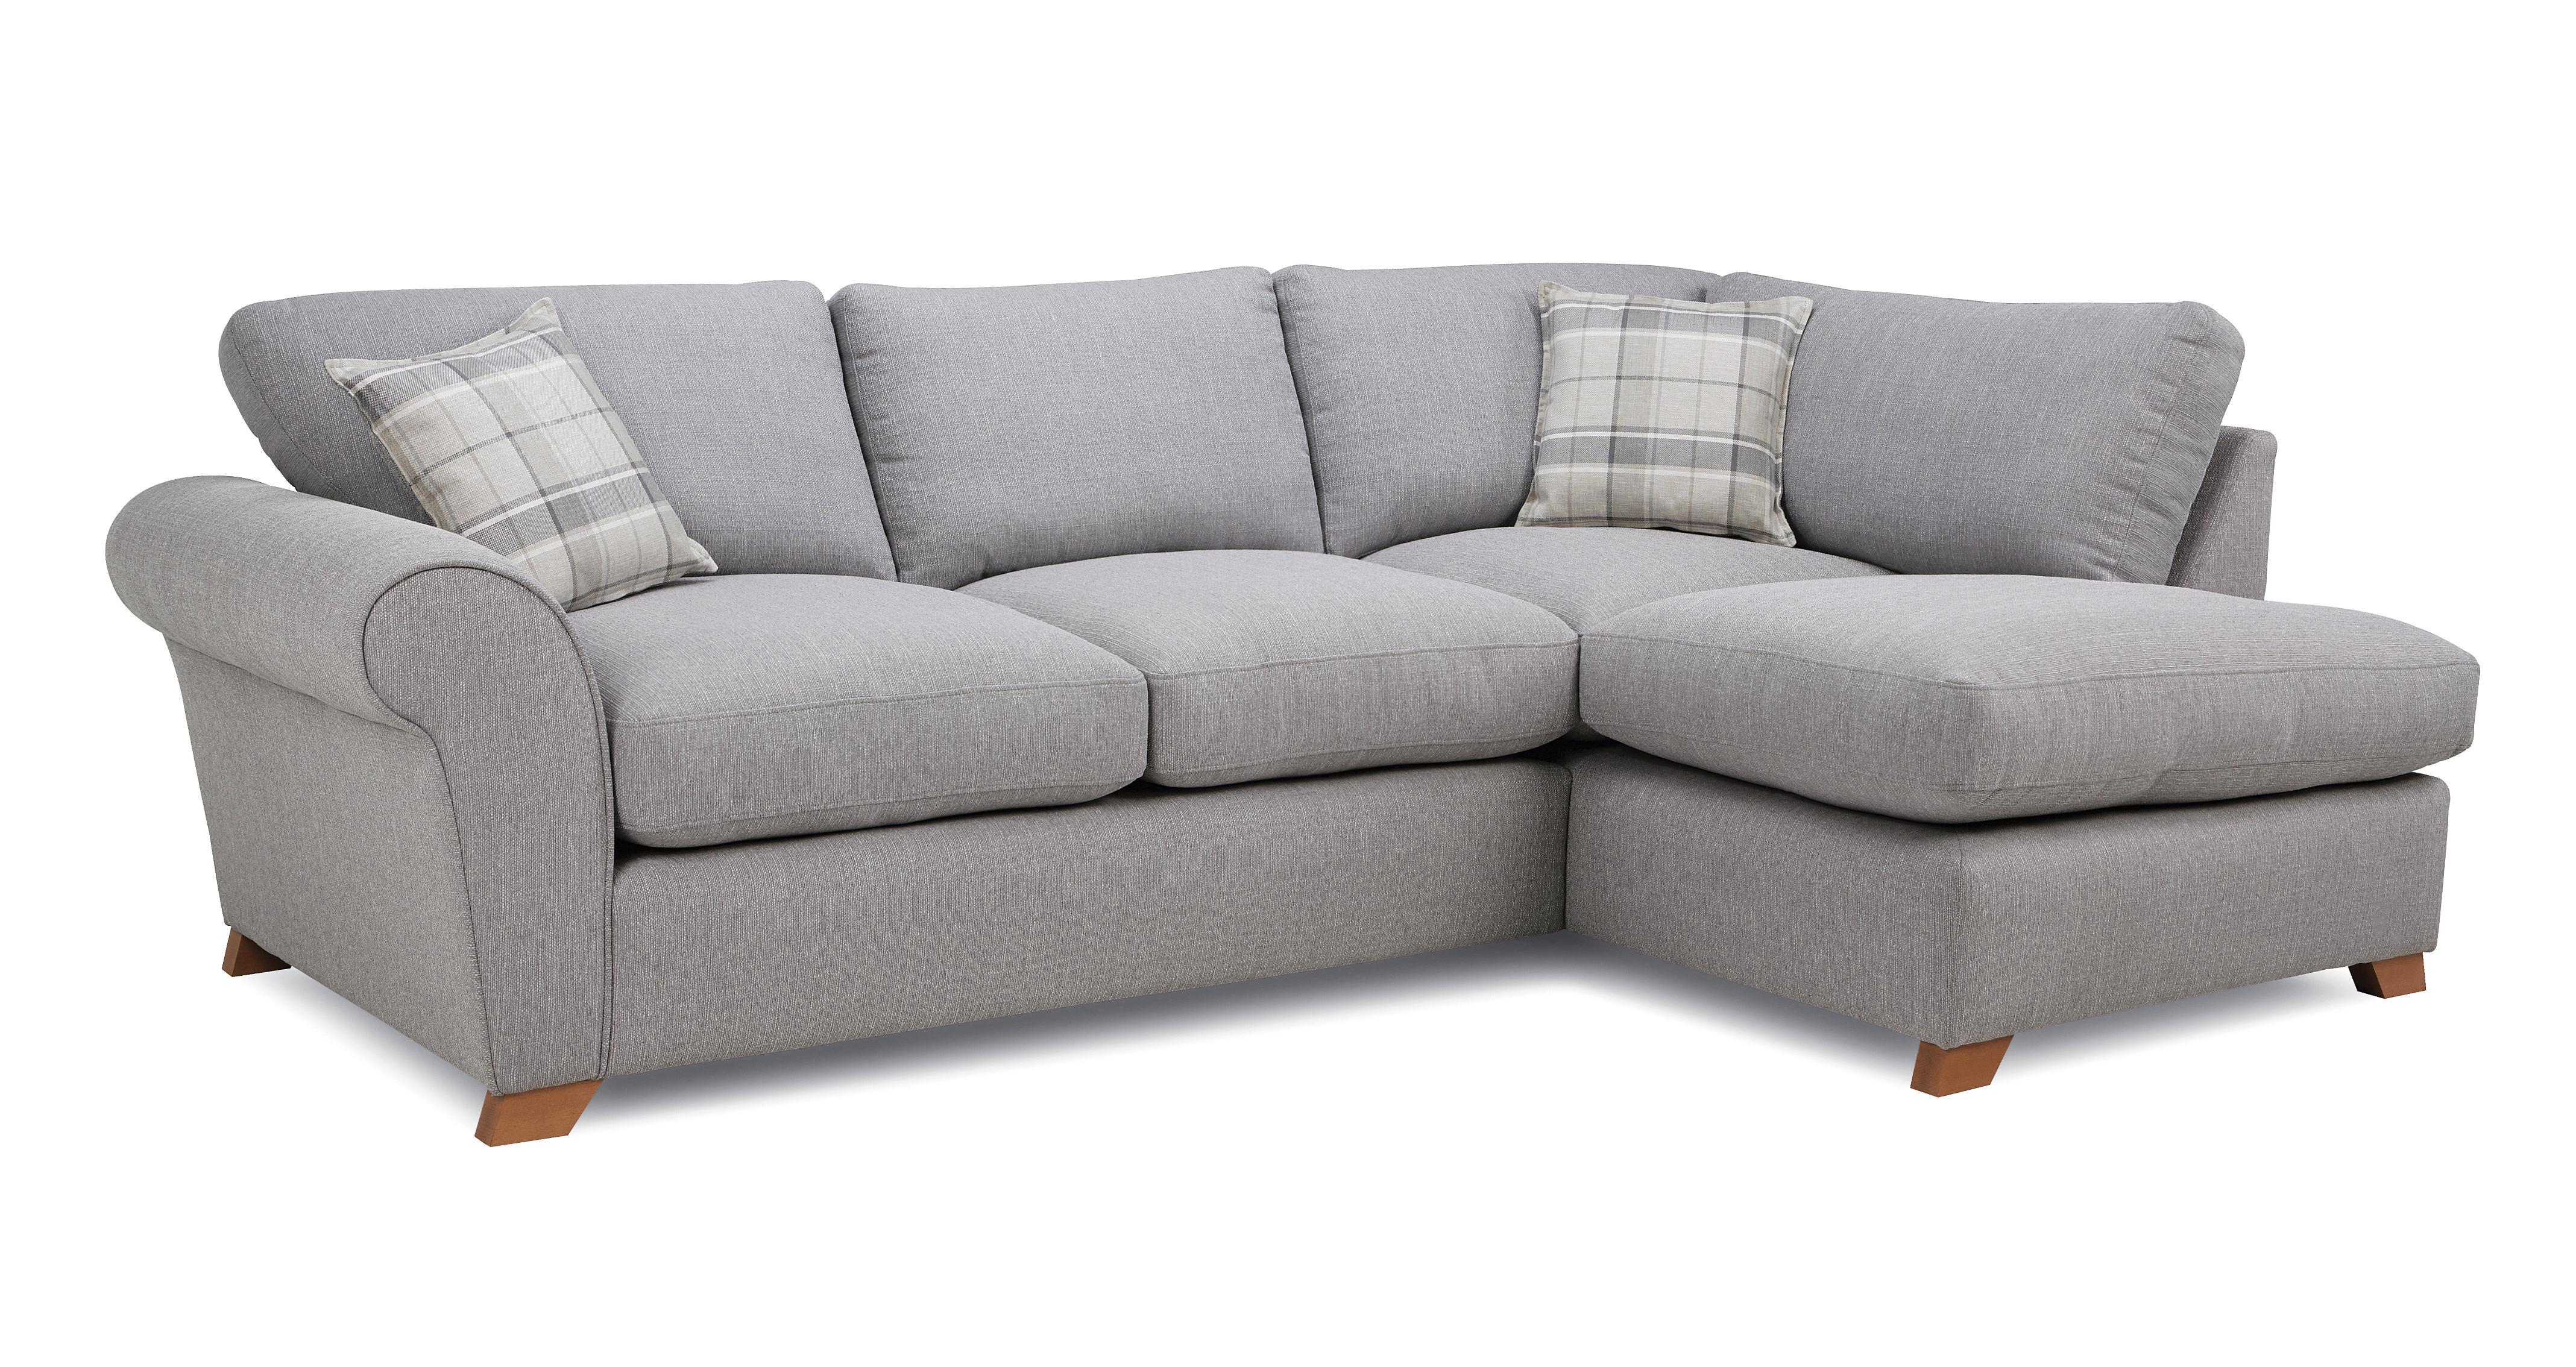 Dfs Celine Corner Sofa Bed Review Home Co